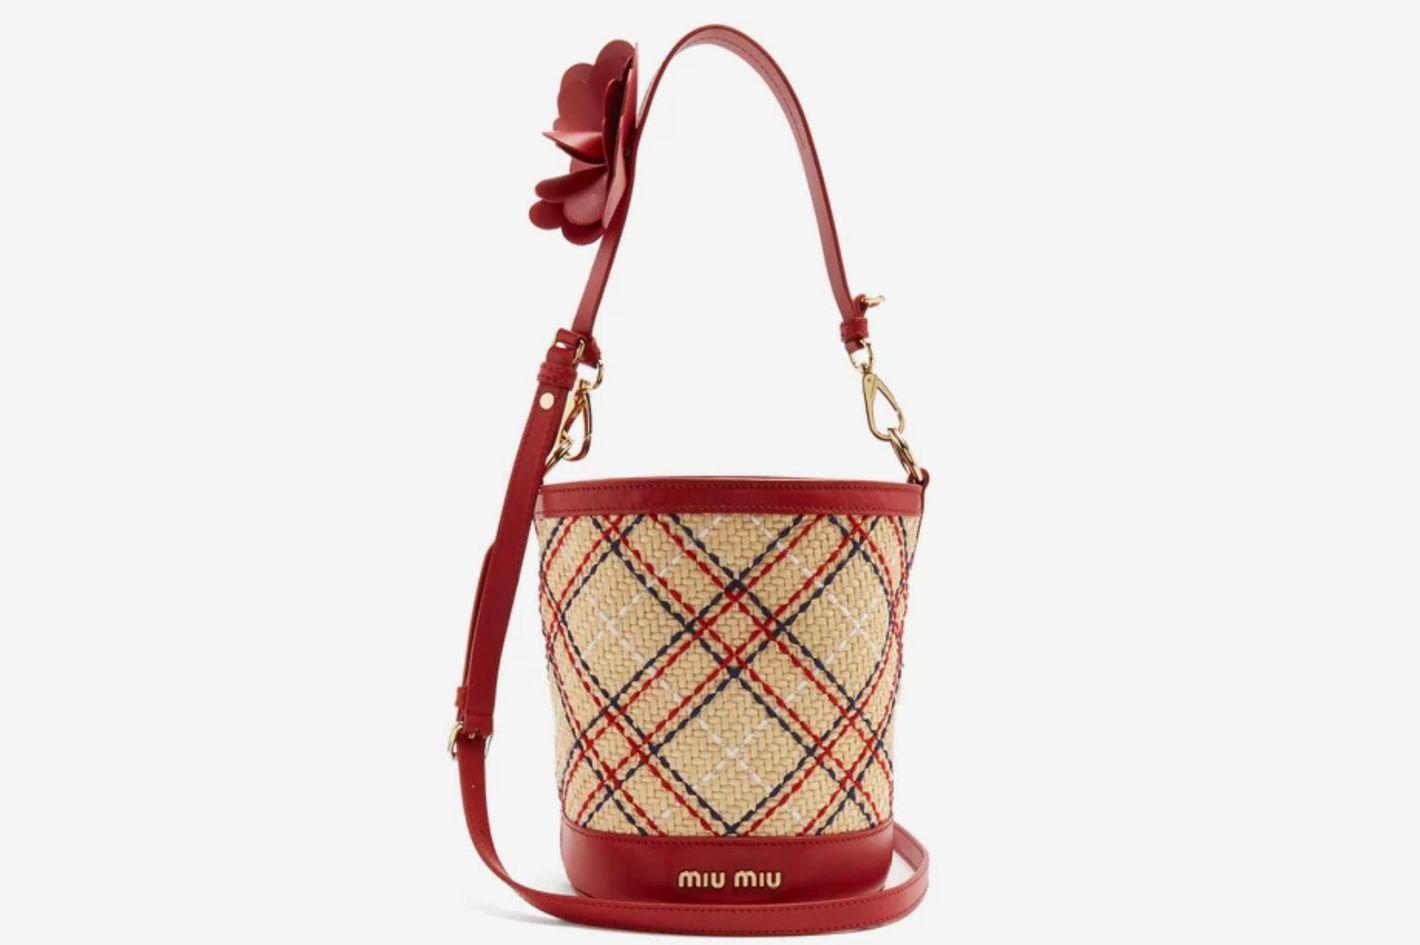 Miu Miu Embroidered-Raffia Bucket Bag